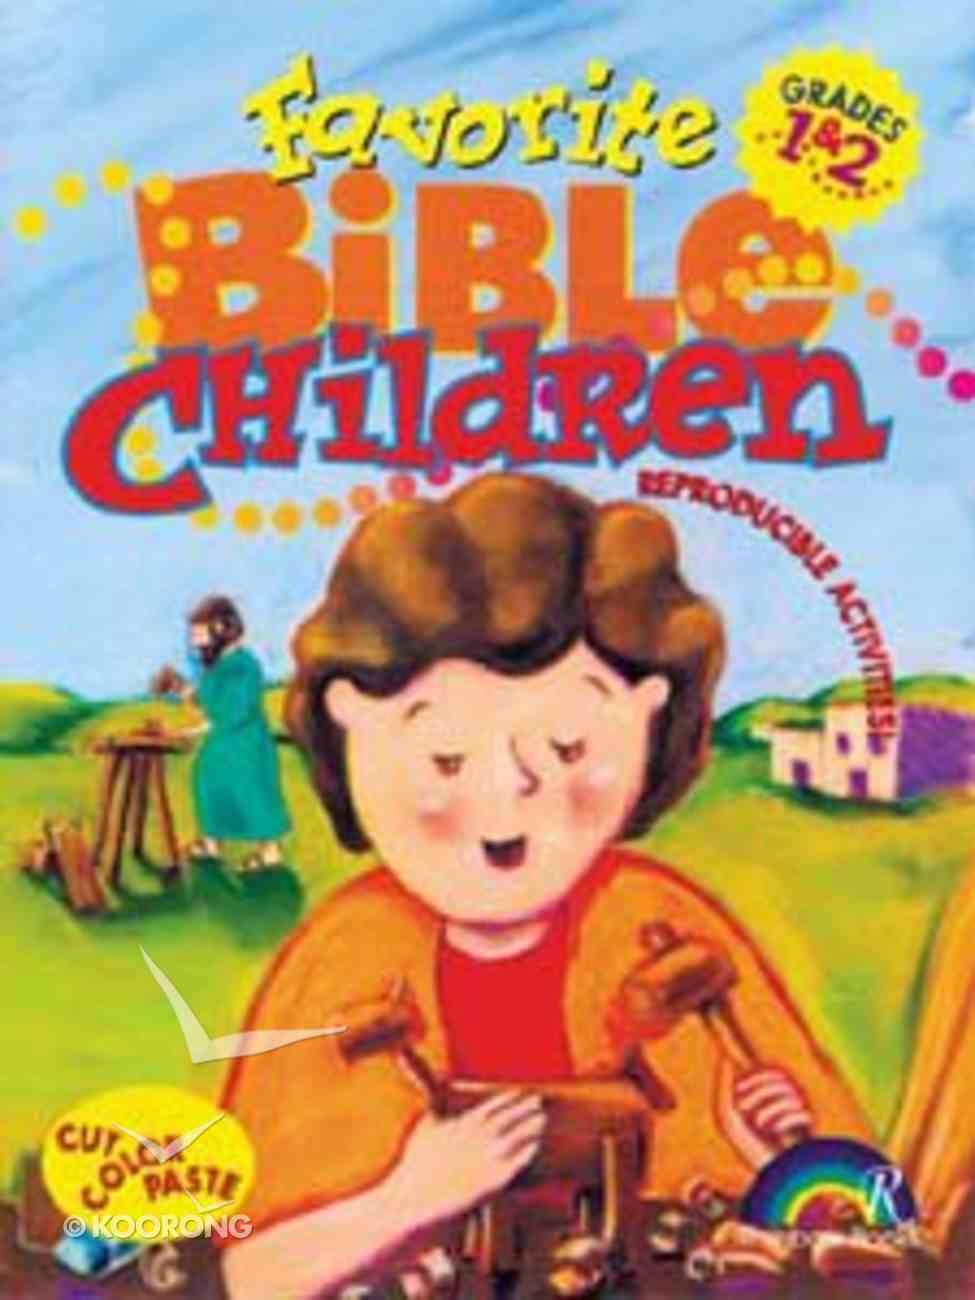 Grades 1&2 (Reproducible) (Favourite Bible Children Series) Paperback